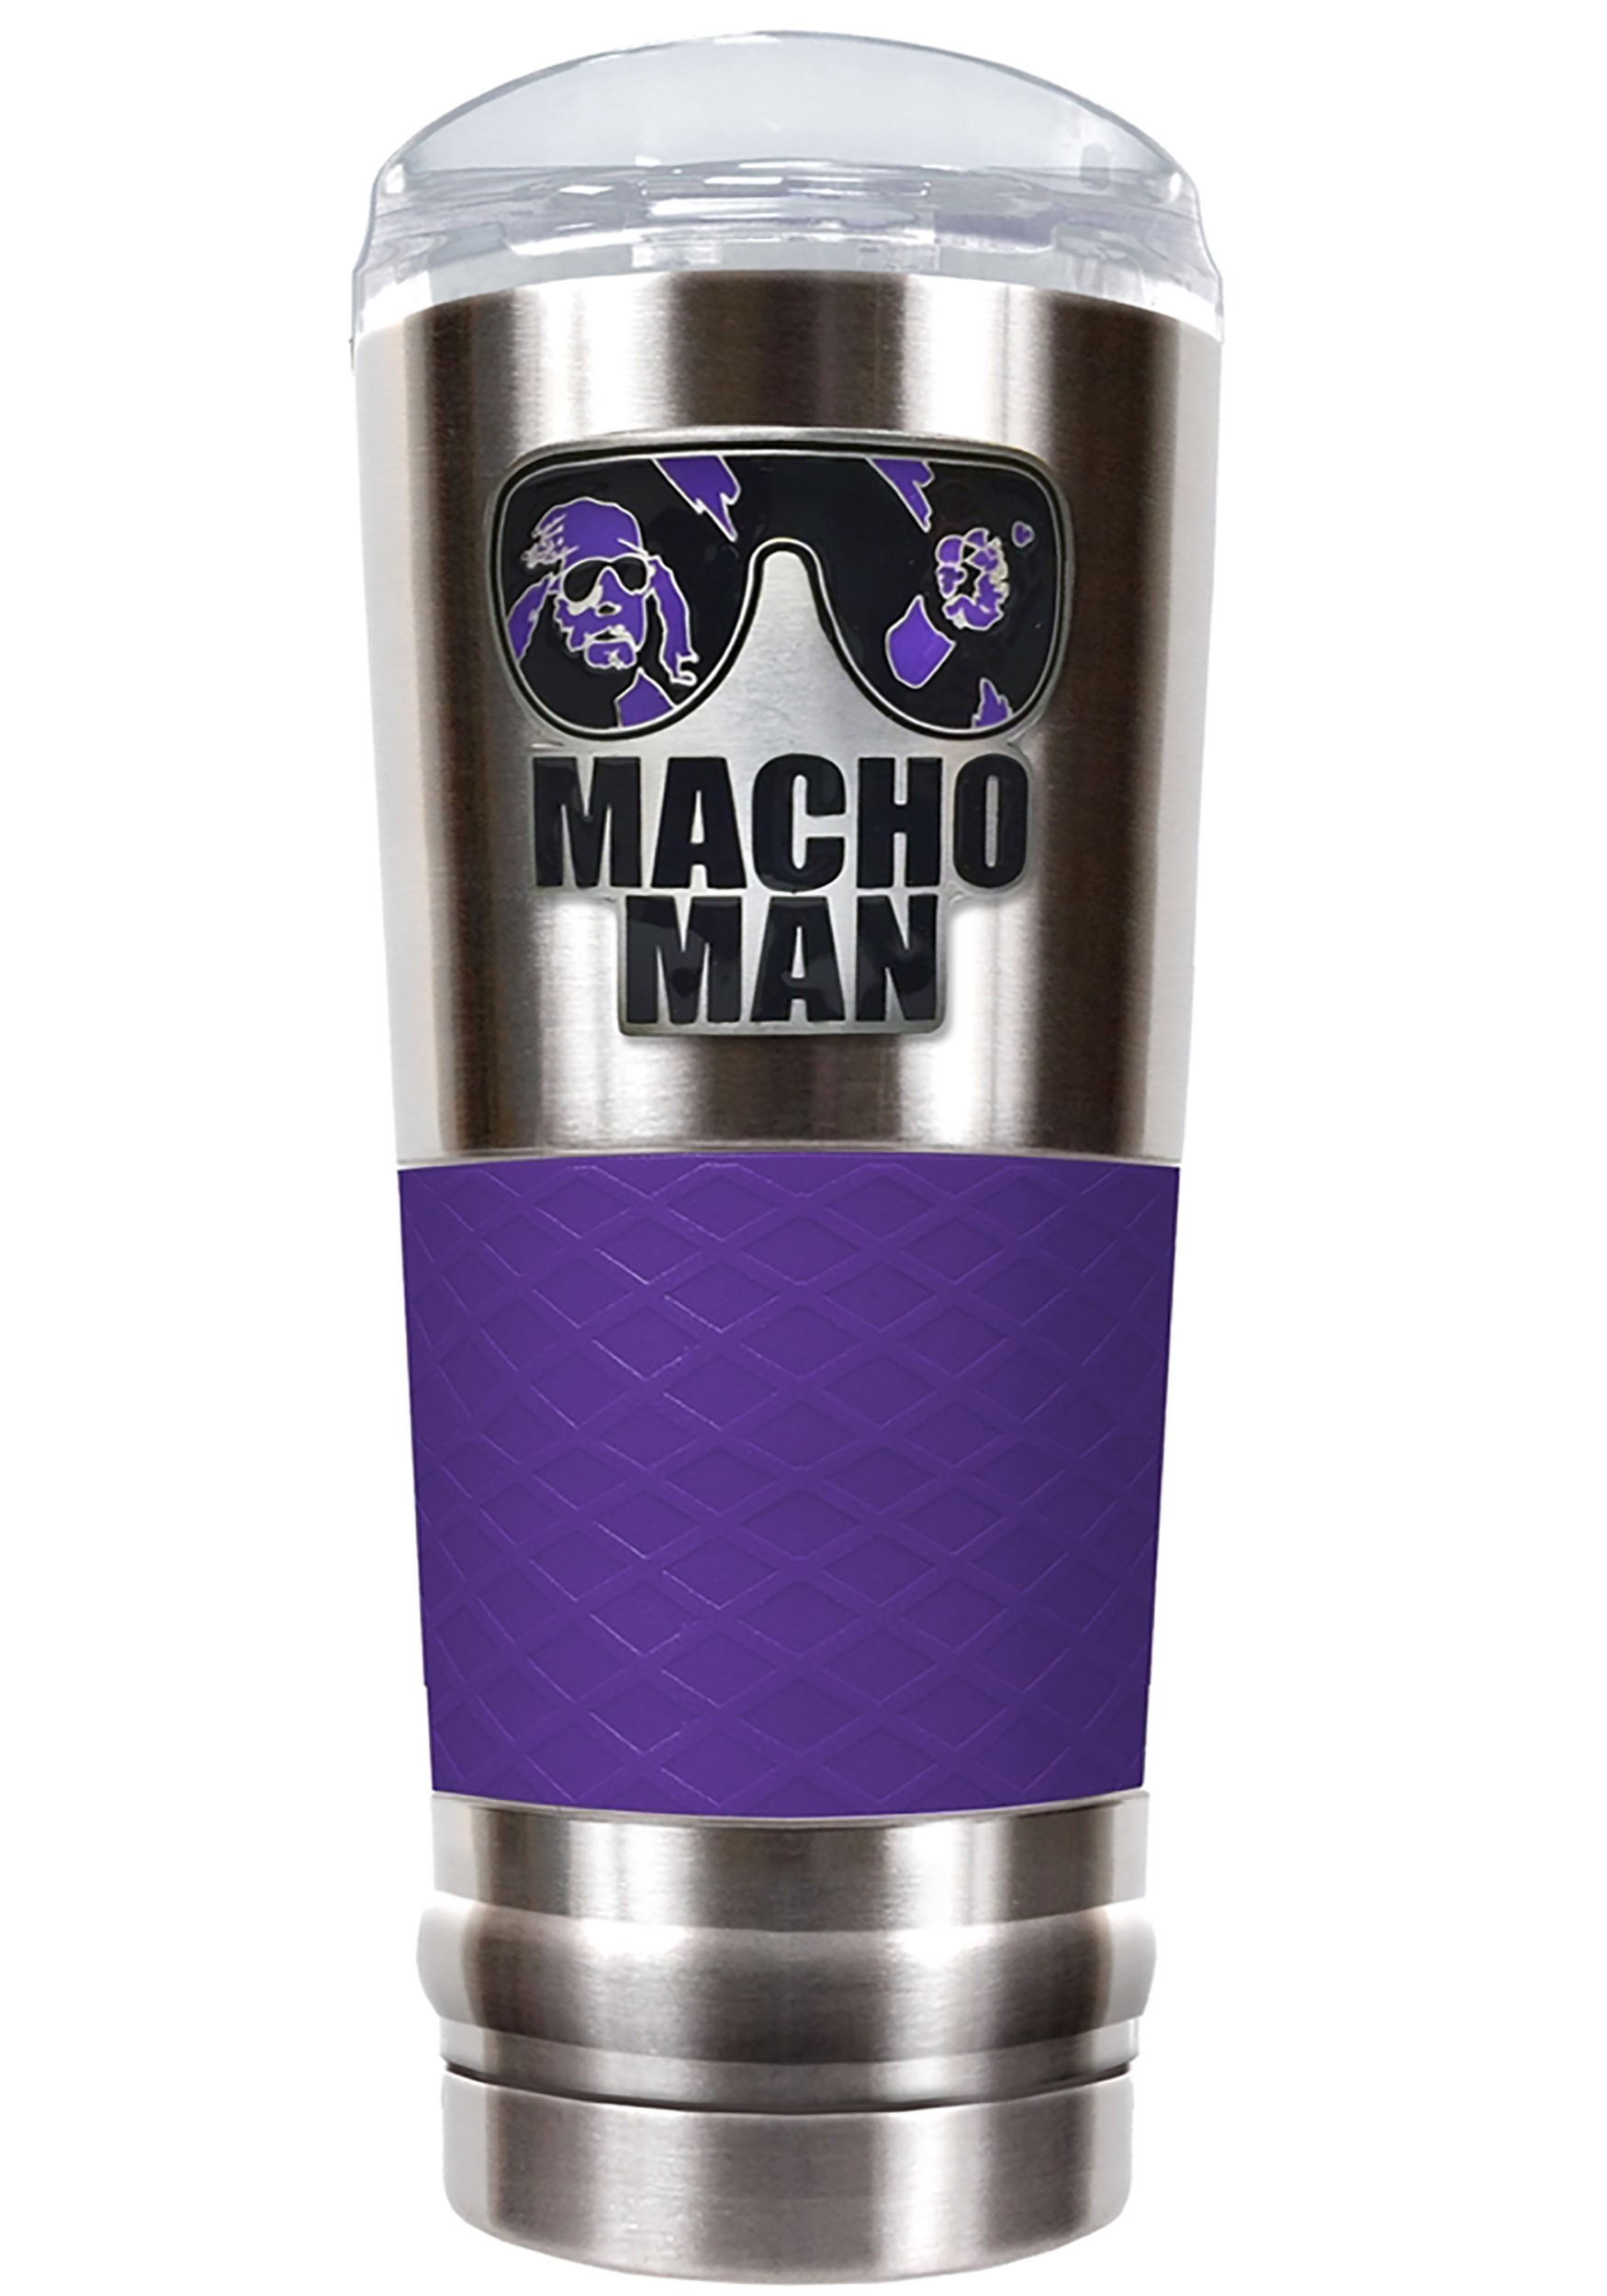 24 oz WWE Macho Man Stainless Steel Tumbler w/ Silicone Grip